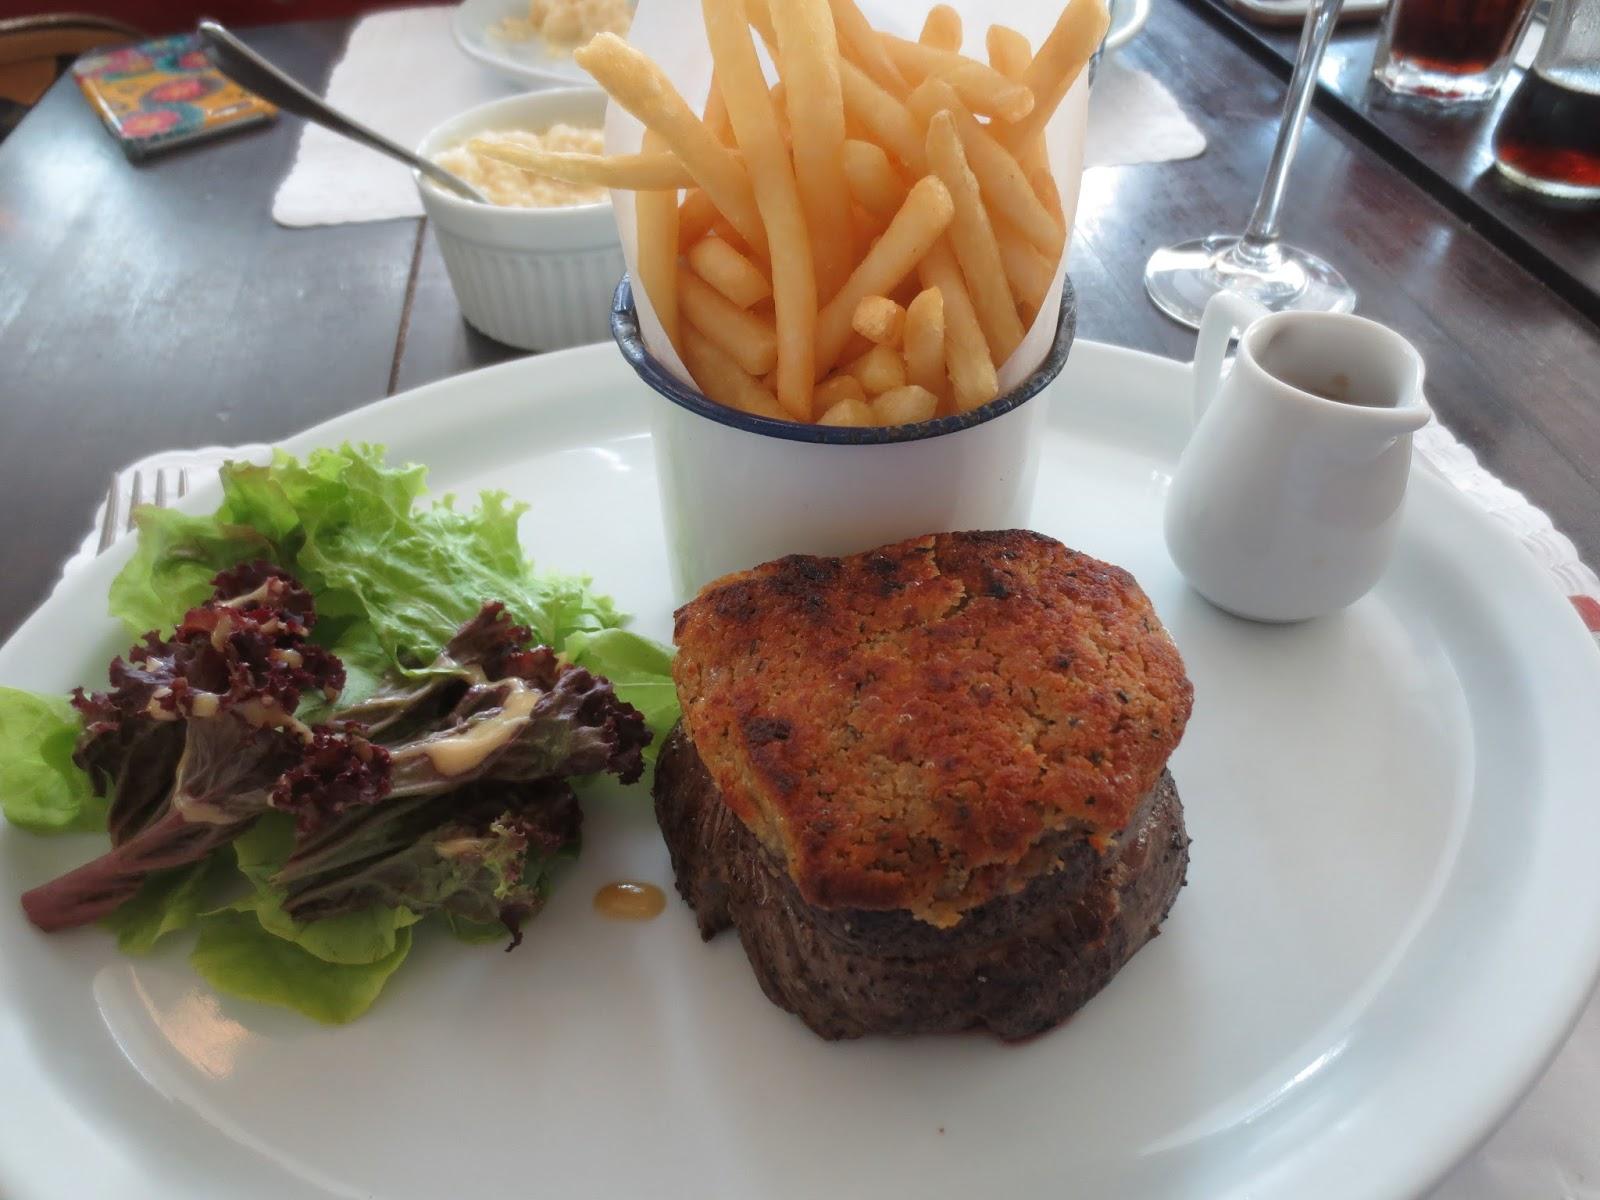 CT Brasserie Another Claude Troisgros Restaurant in Rio de